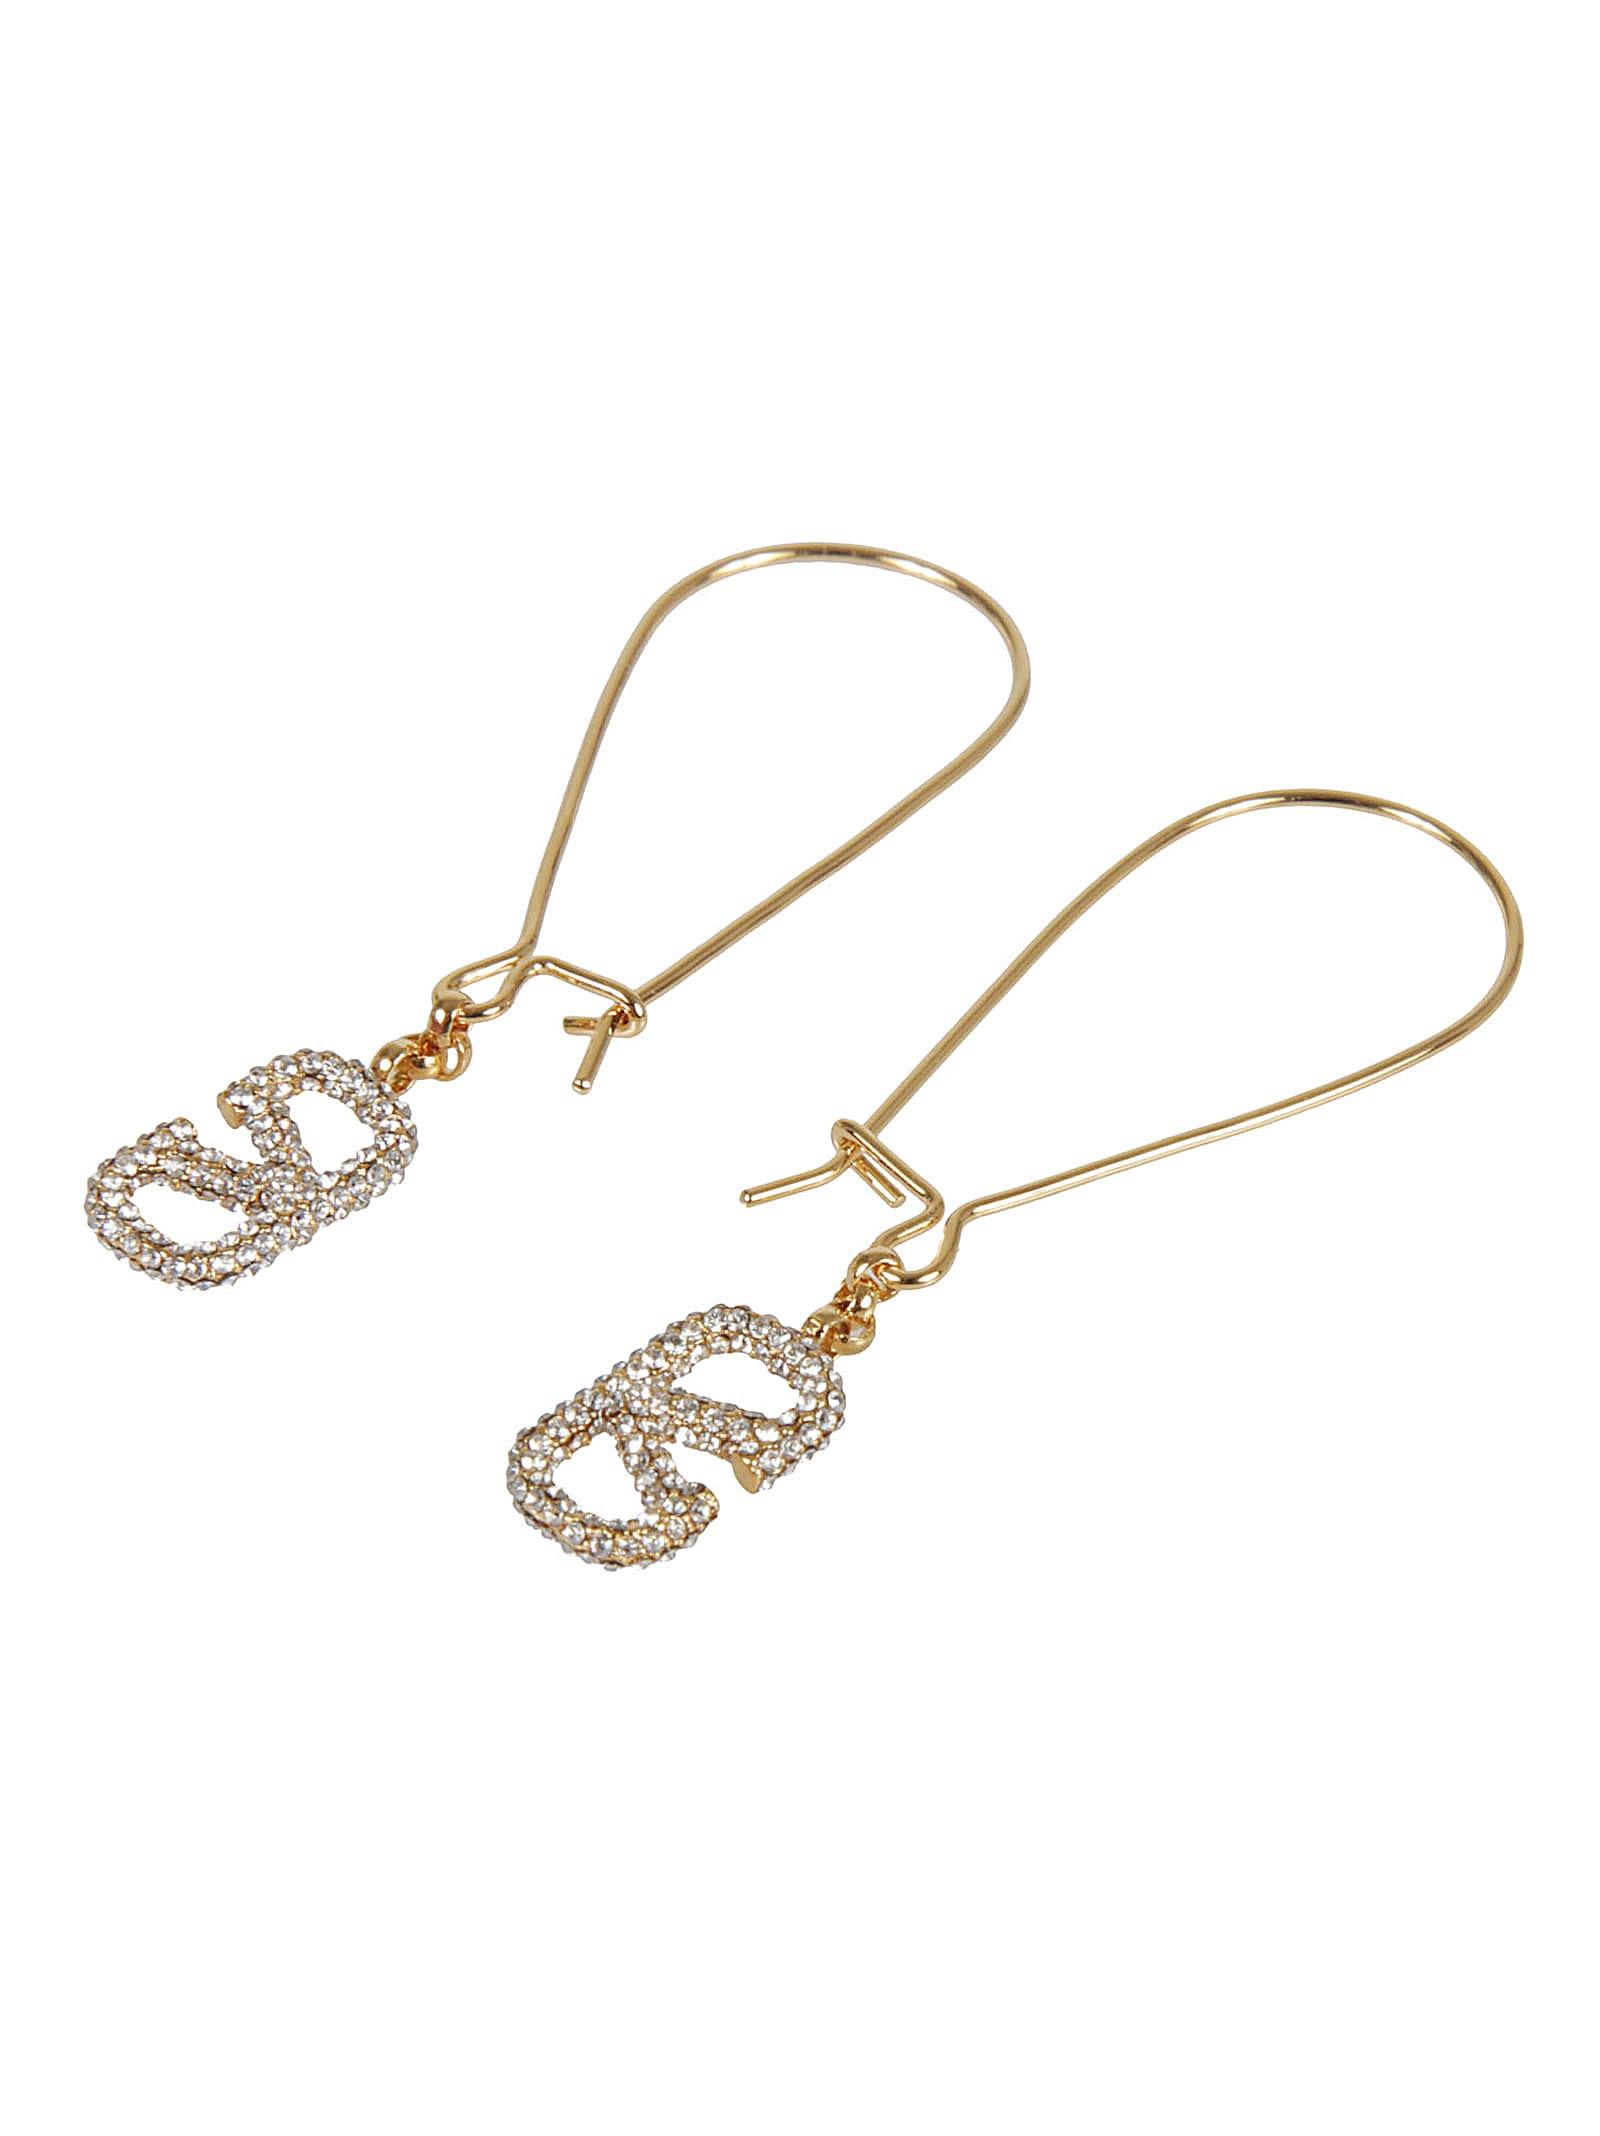 Valentino Garavani Pendant Earrings